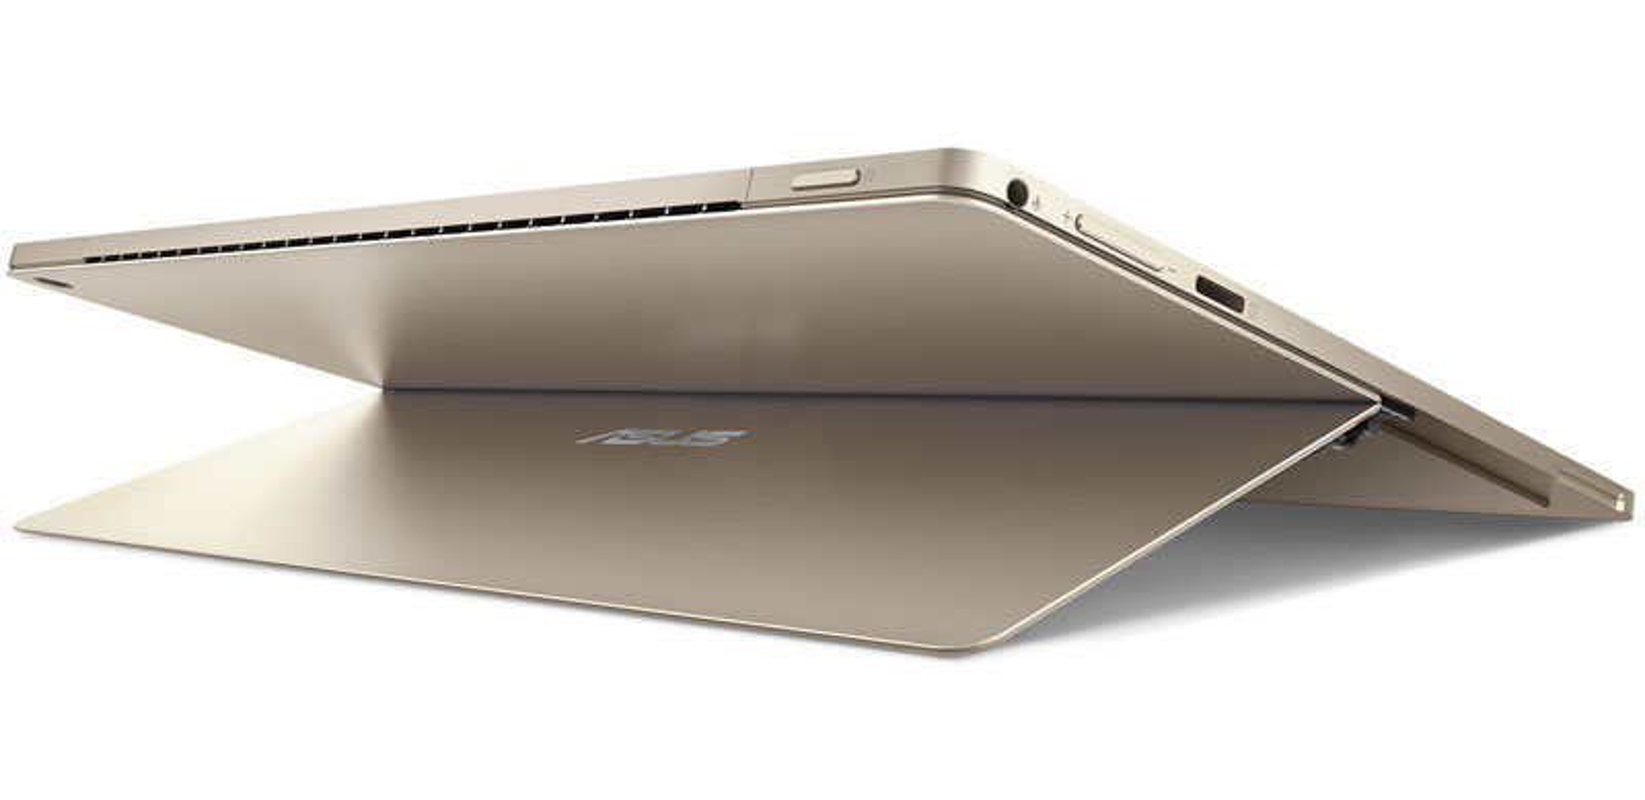 Soi bo ba may tinh bang lai laptop Asus vua ra mat-Hinh-3